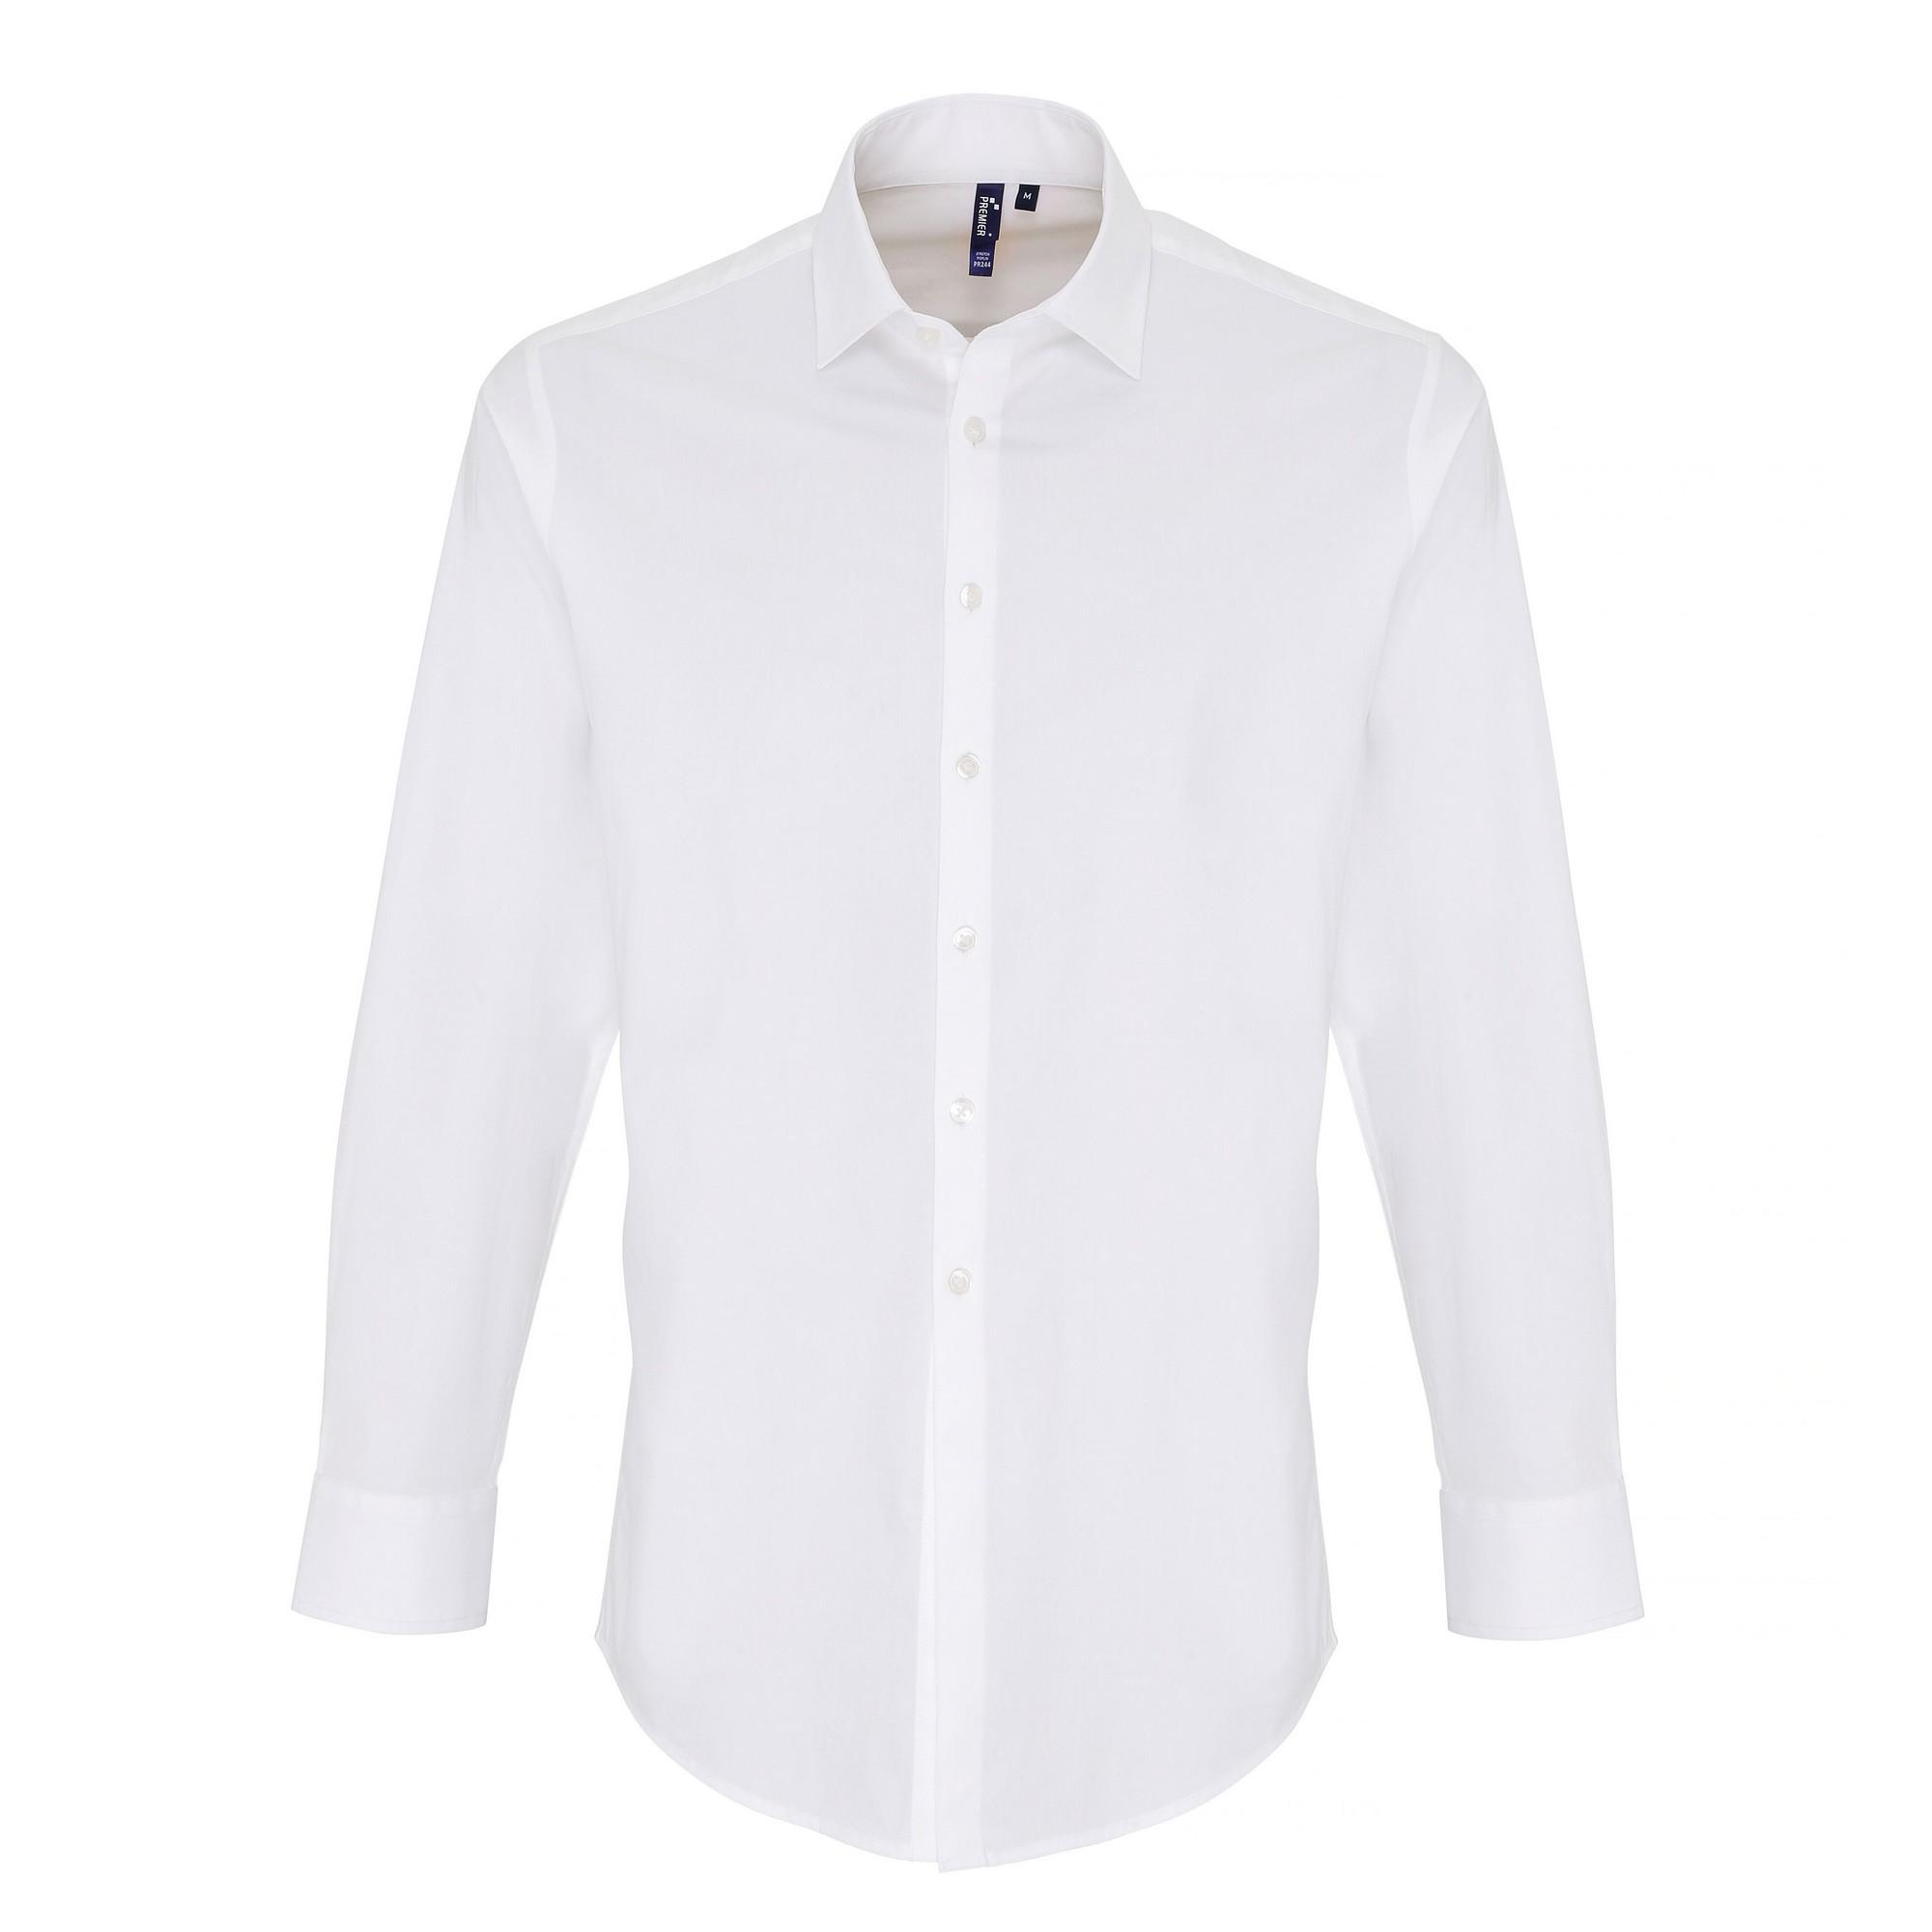 Premier Mens Stretch Fit Poplin Long Sleeve Shirt (4XL) (White)